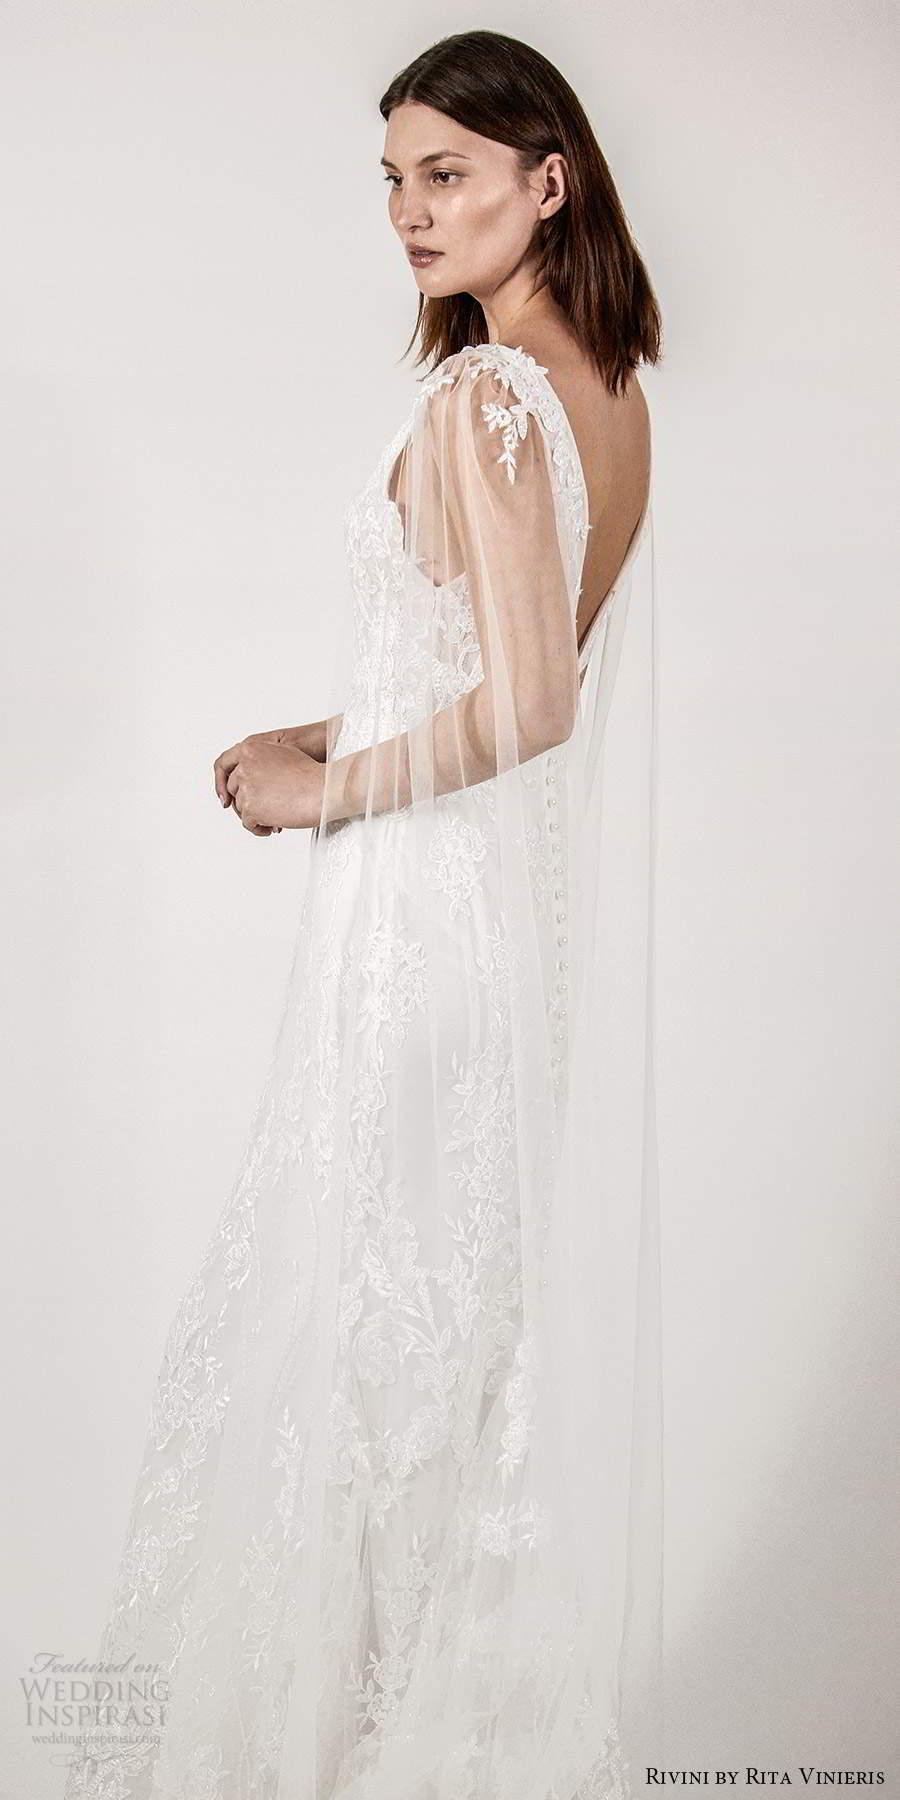 rivini rita vinieris spring 2021 bridal illusion split long sleeves thick straps plunging v neckline fully embellished lace sheath wedding dress chapel train (5) sv